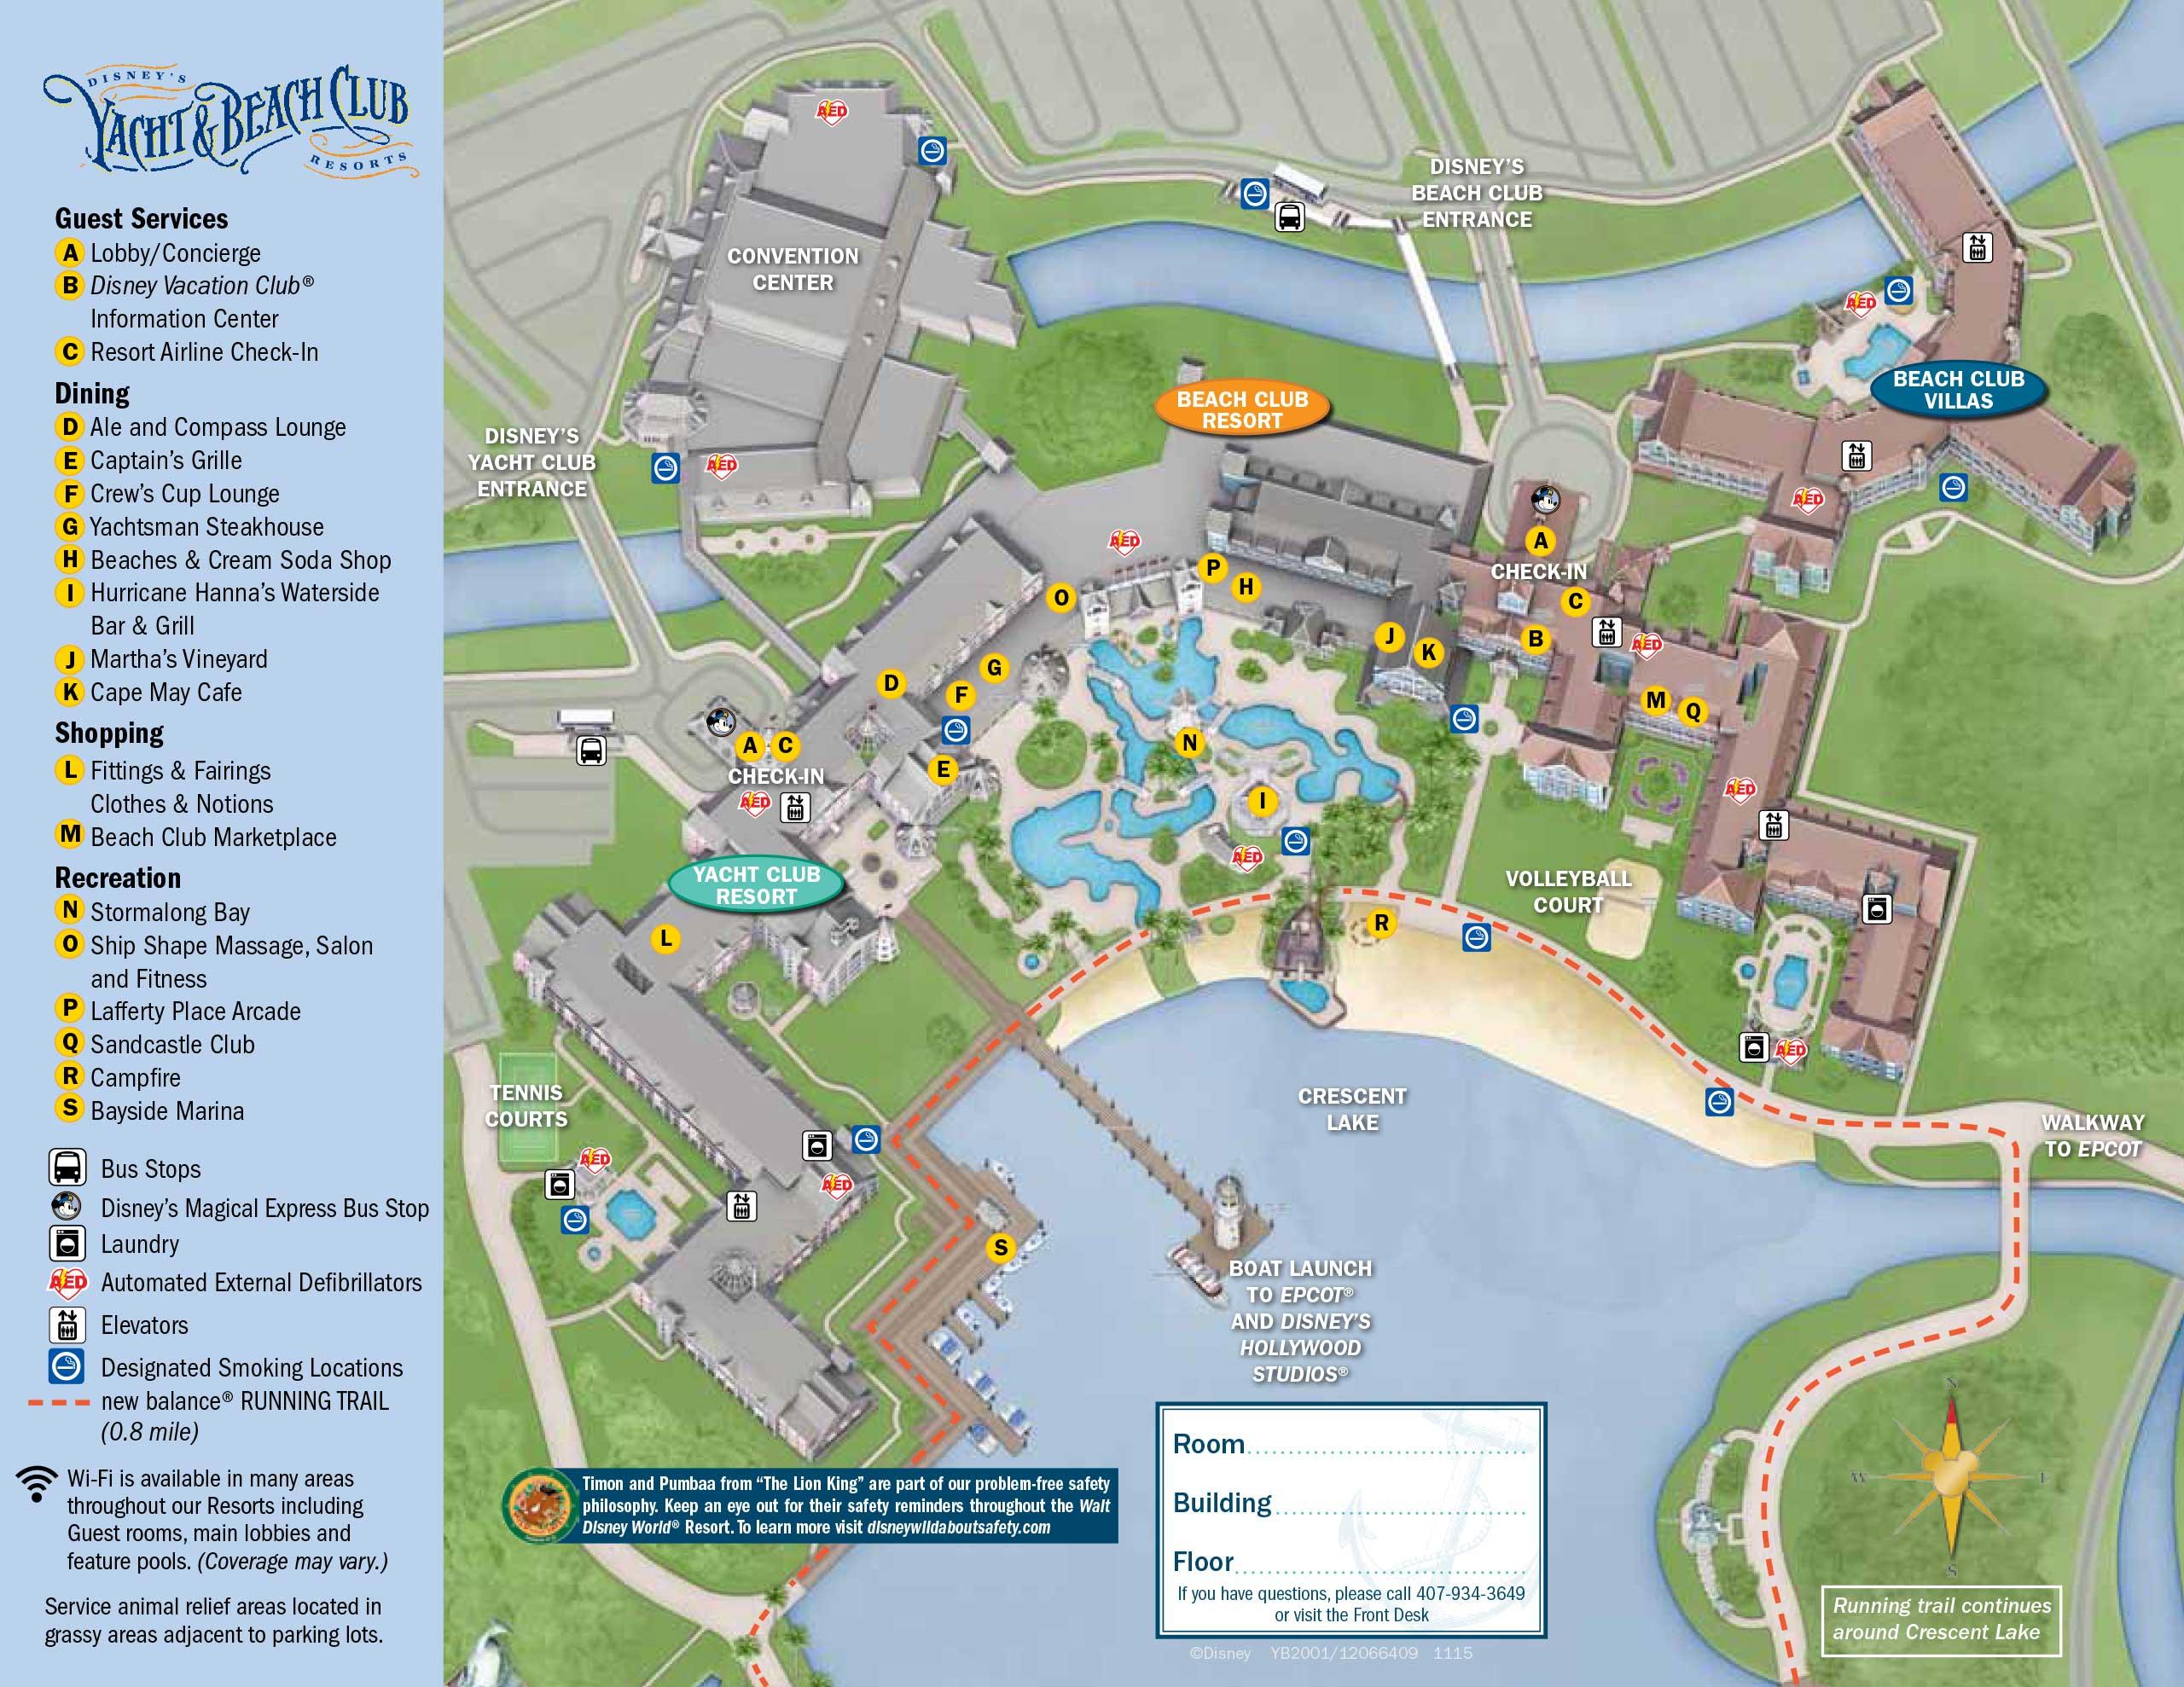 April 2017 Walt Disney World Resort Hotel Maps - Photo 33 of 33